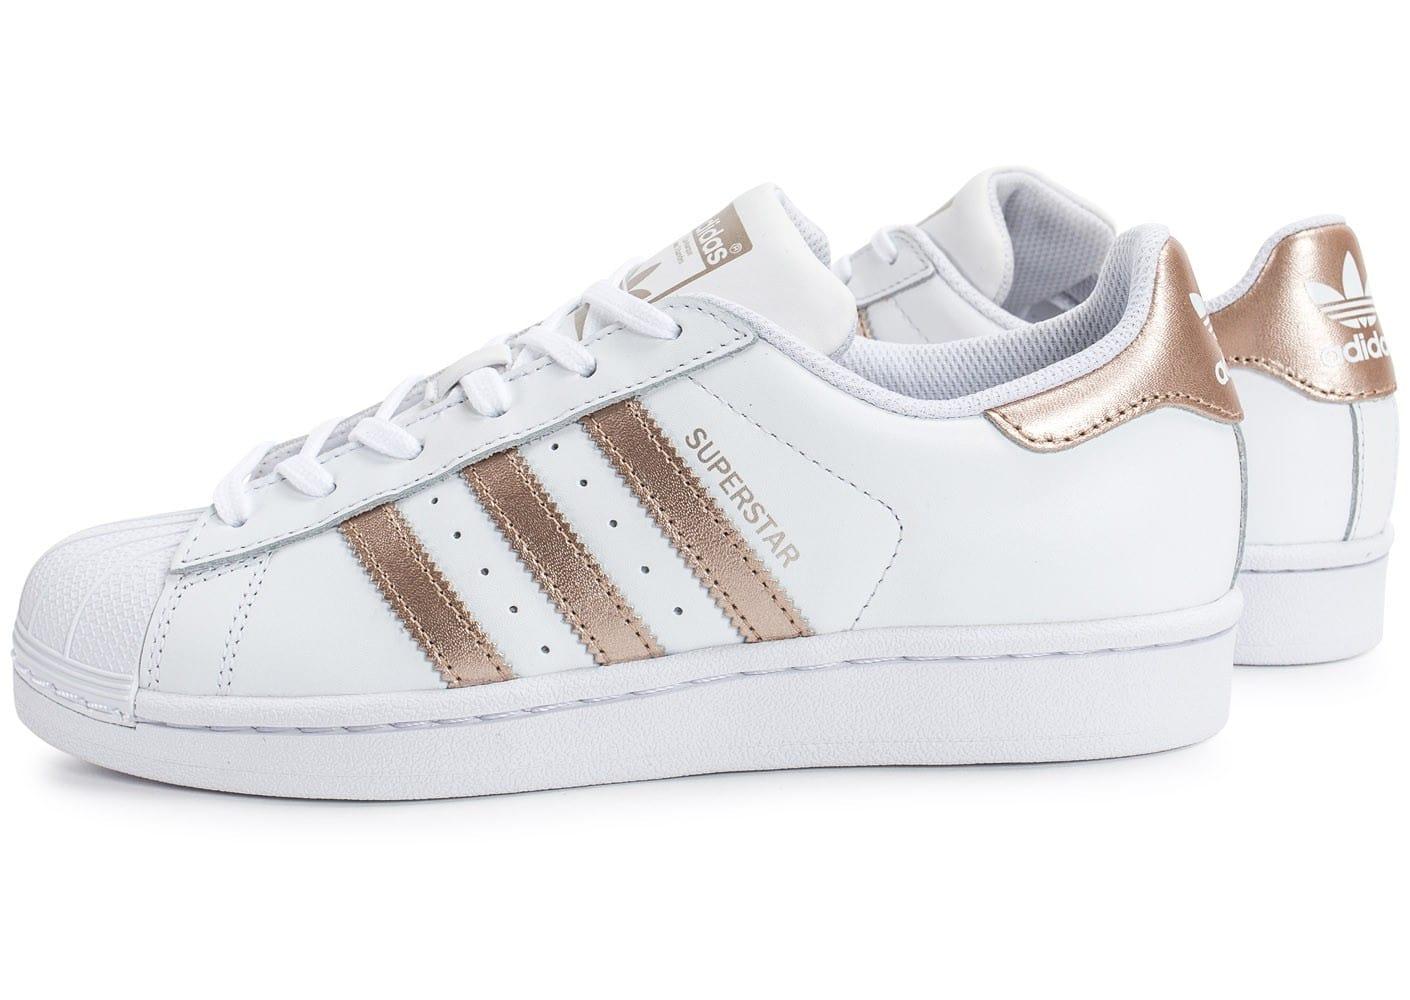 énorme réduction 1e5b9 7d9b8 chaussure superstar rose gold